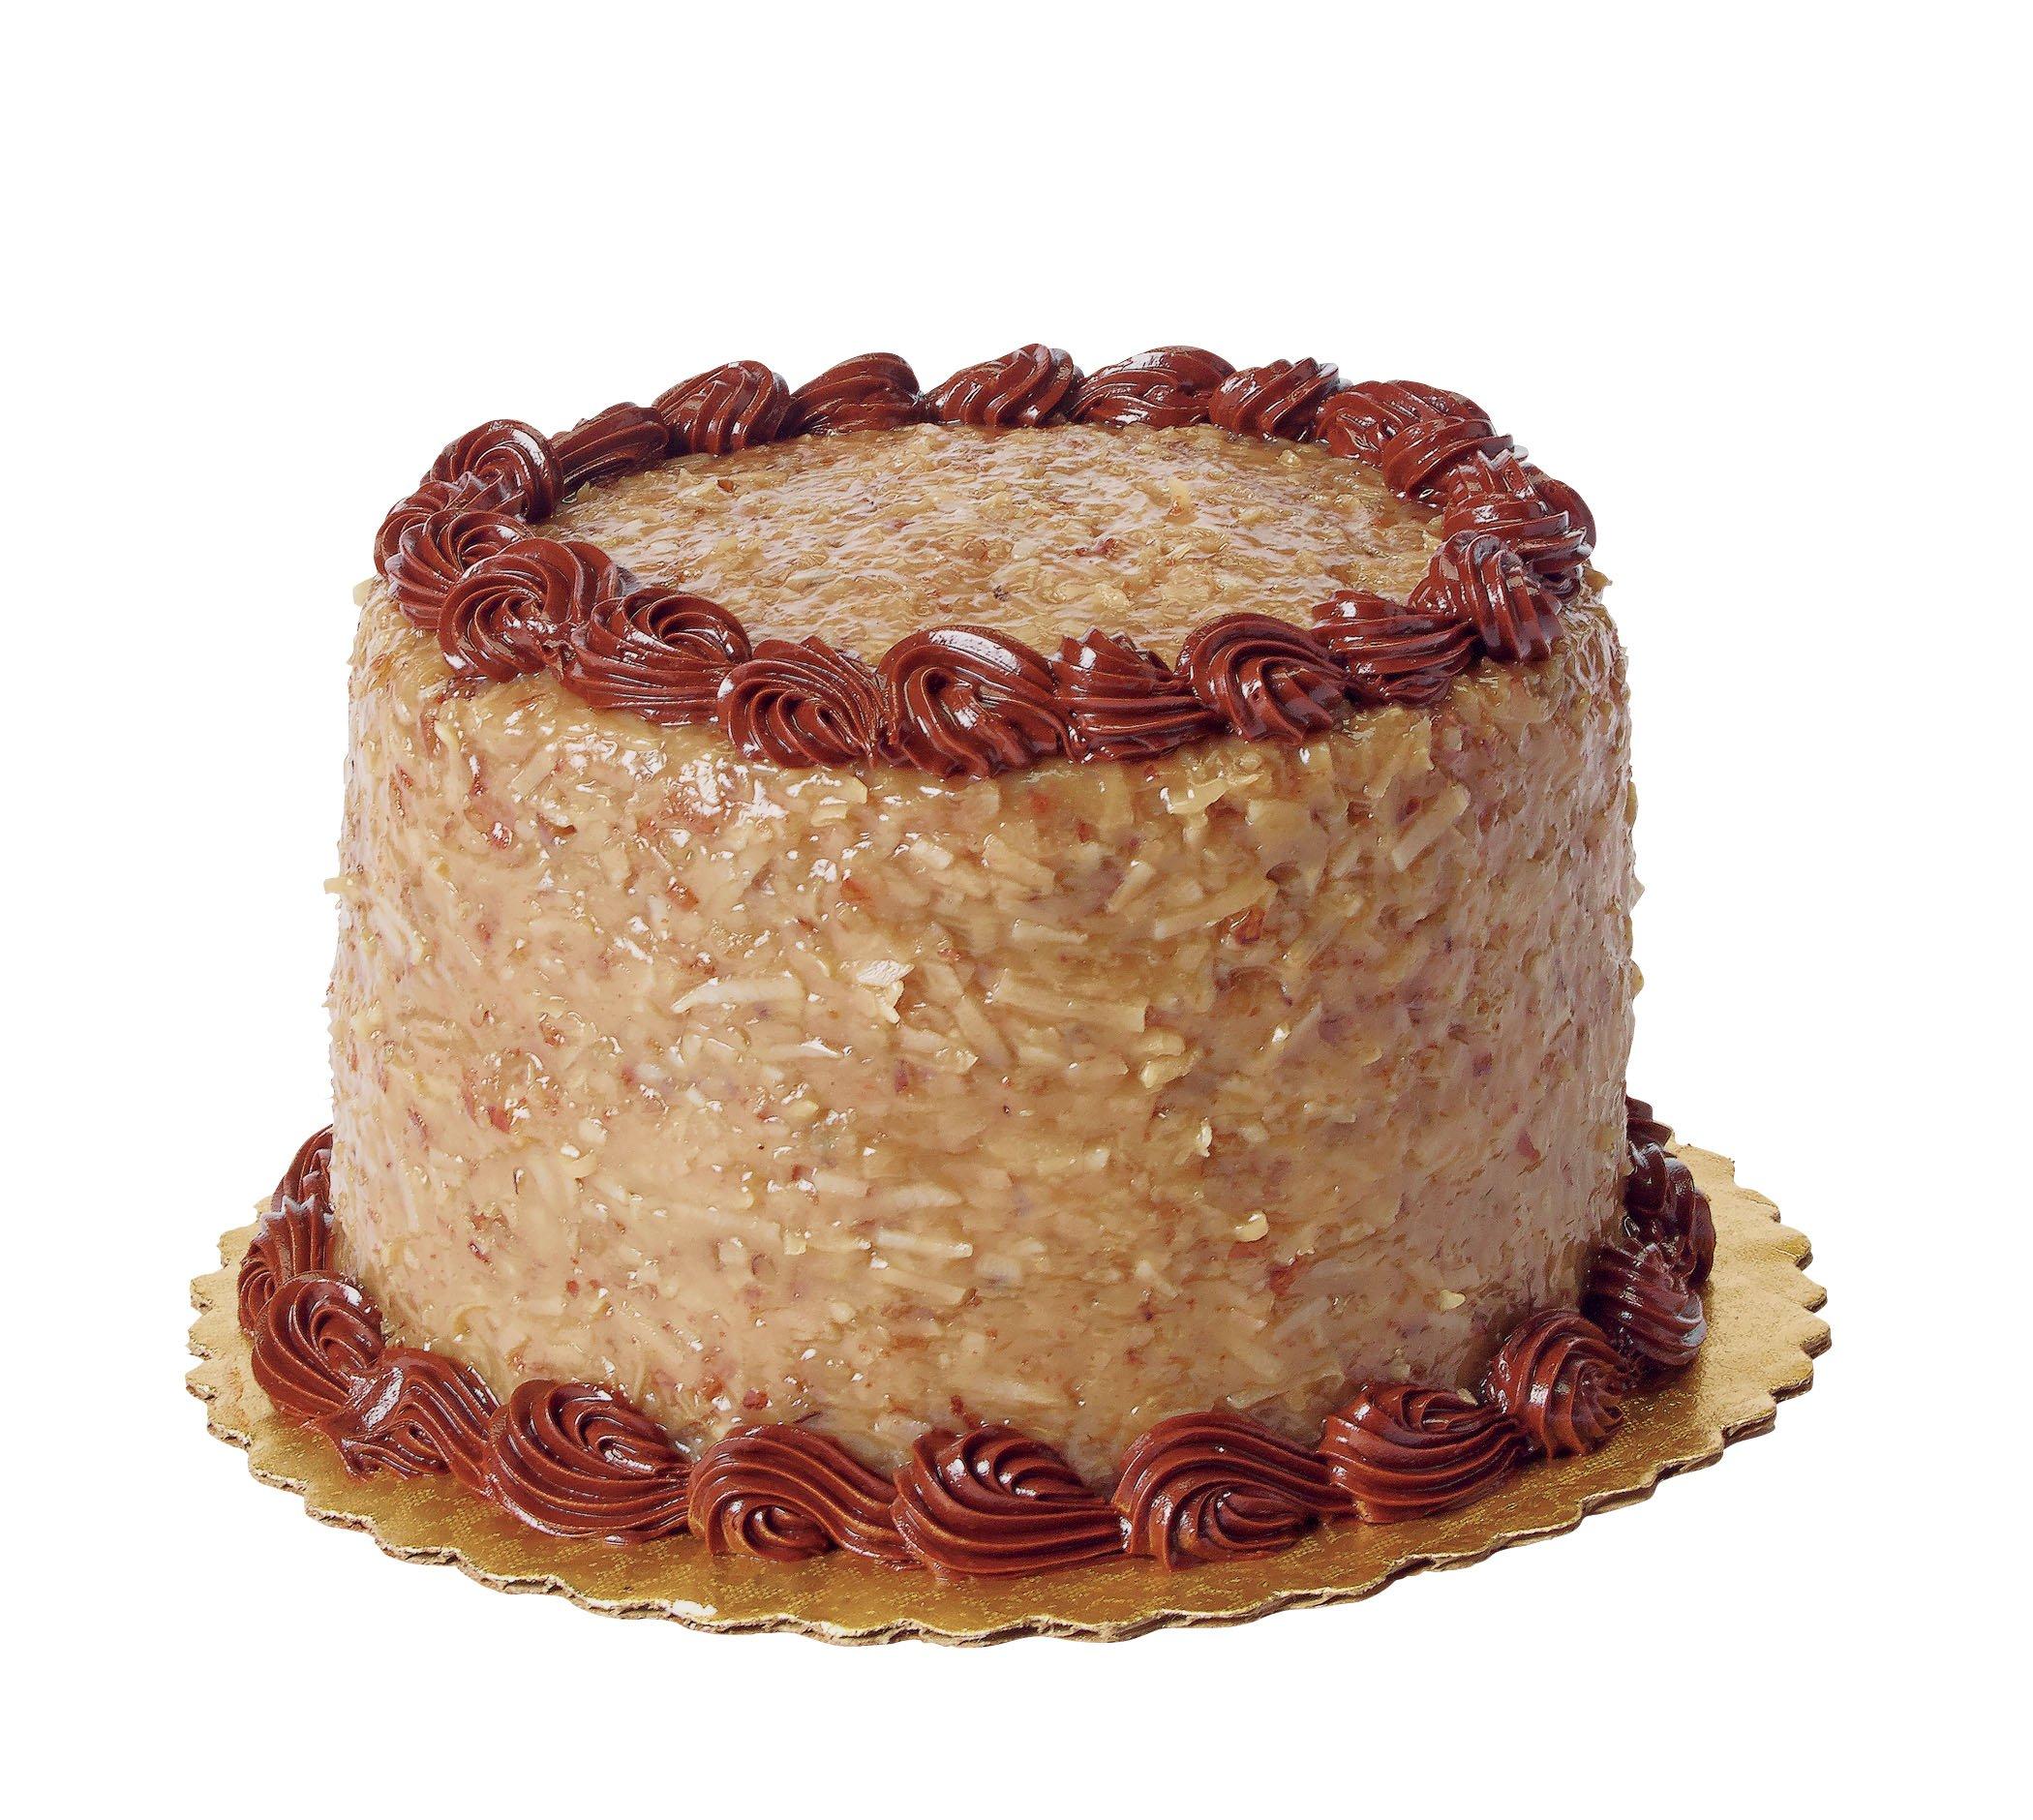 Heb Sensational German Chocolate Cake Shop Standard Cakes At Heb